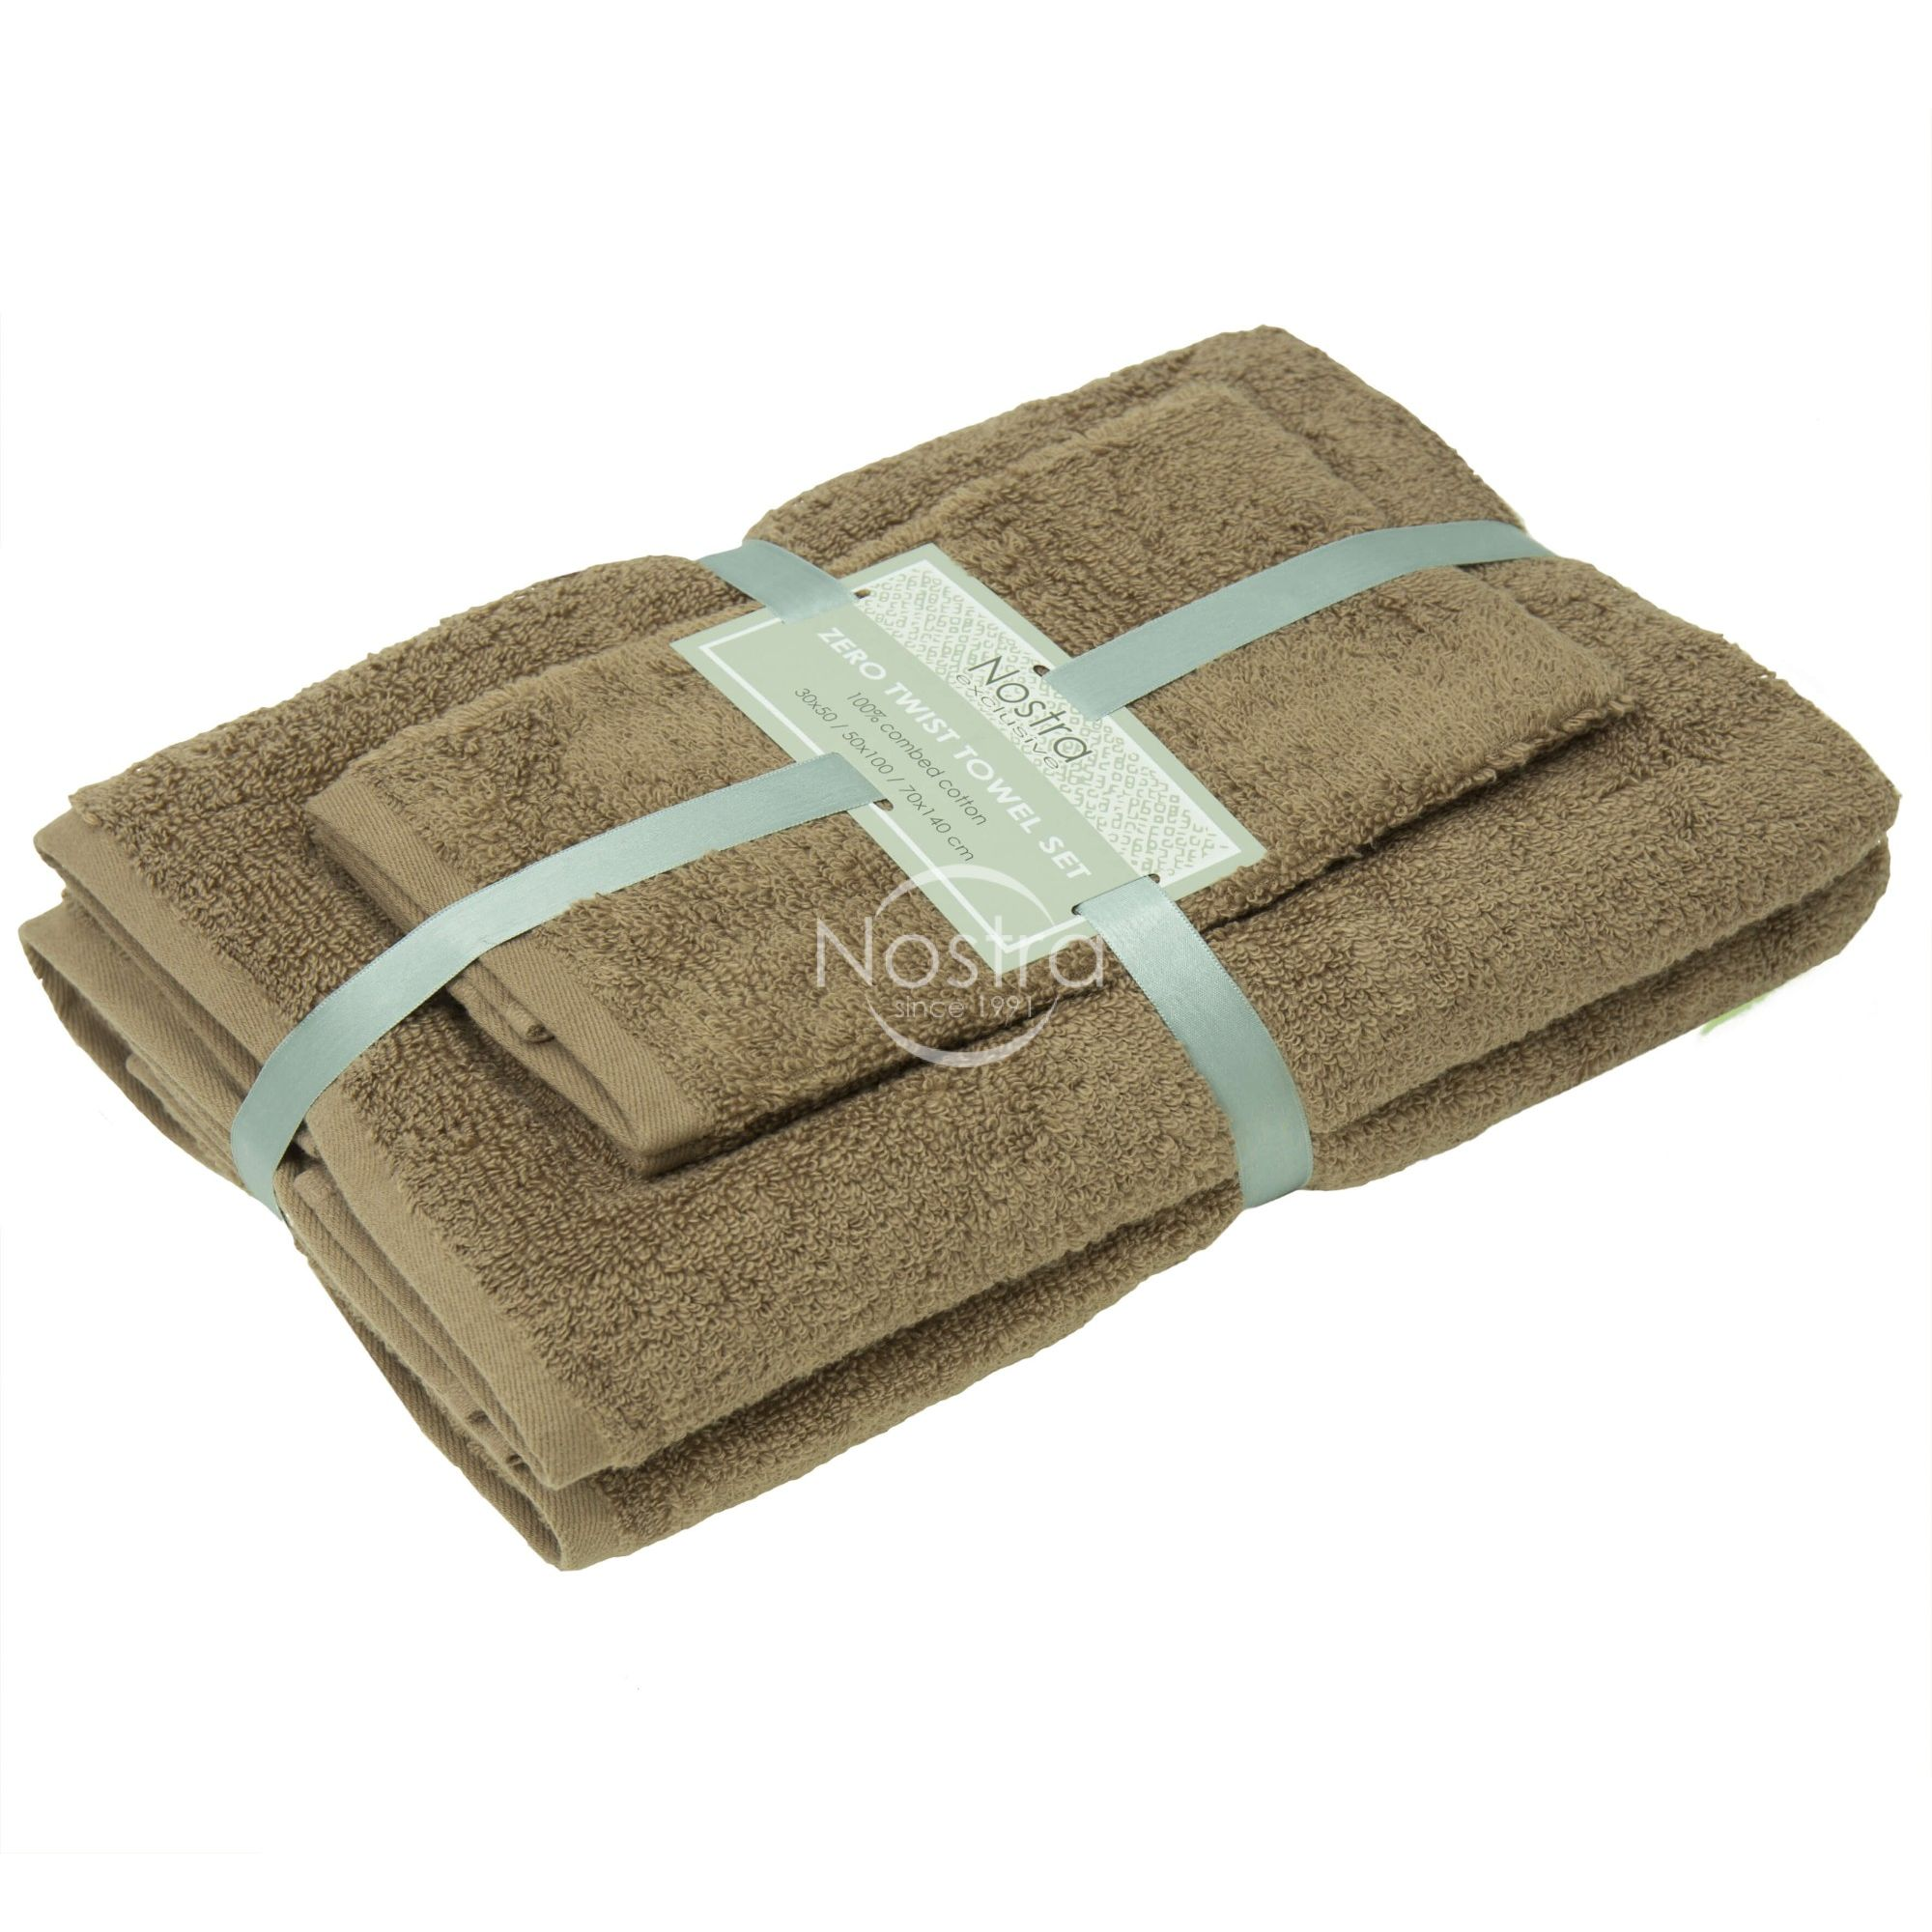 3 dalių rankšluosčių komplektas 380 ZT 380 ZT-ALMOND 30x50, 50x100, 70x140 cm